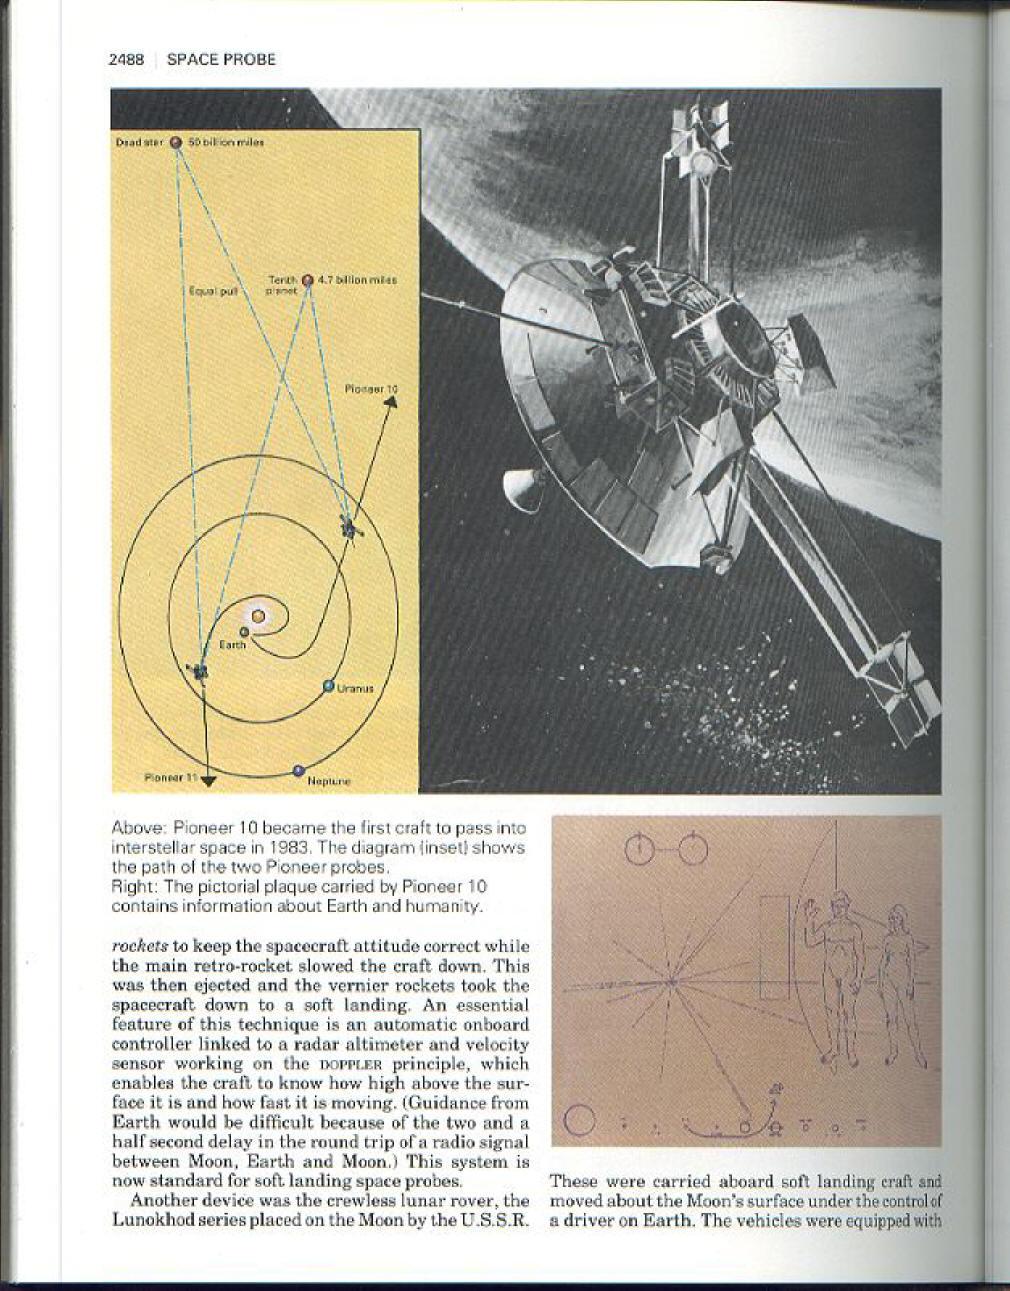 2488 Space Probe